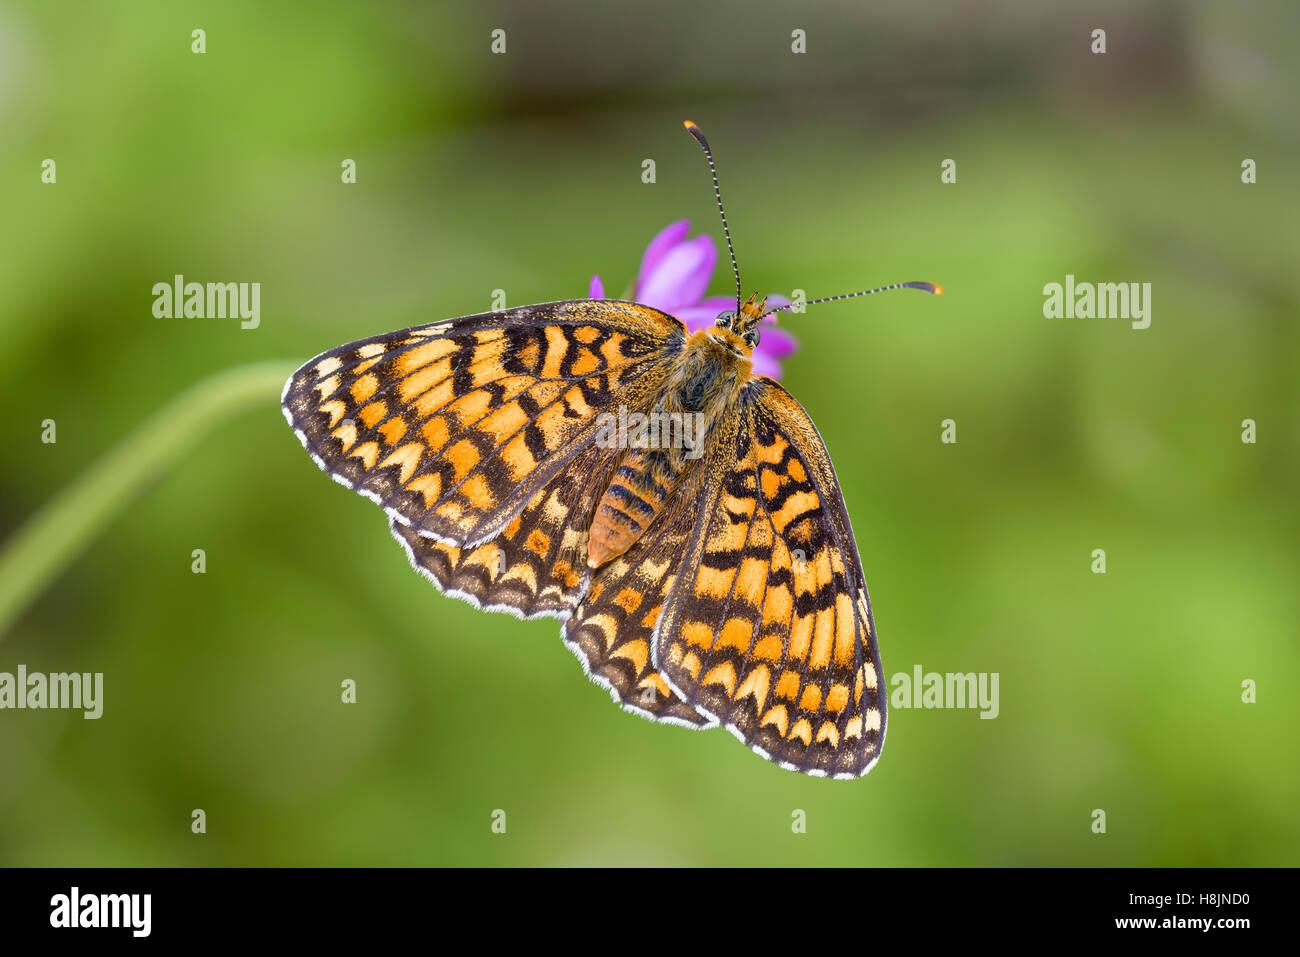 Flockenblumen-Scheckenfalter, Melitaea phoebe, centaurée maculée Fritillary Butterfly Photo Stock